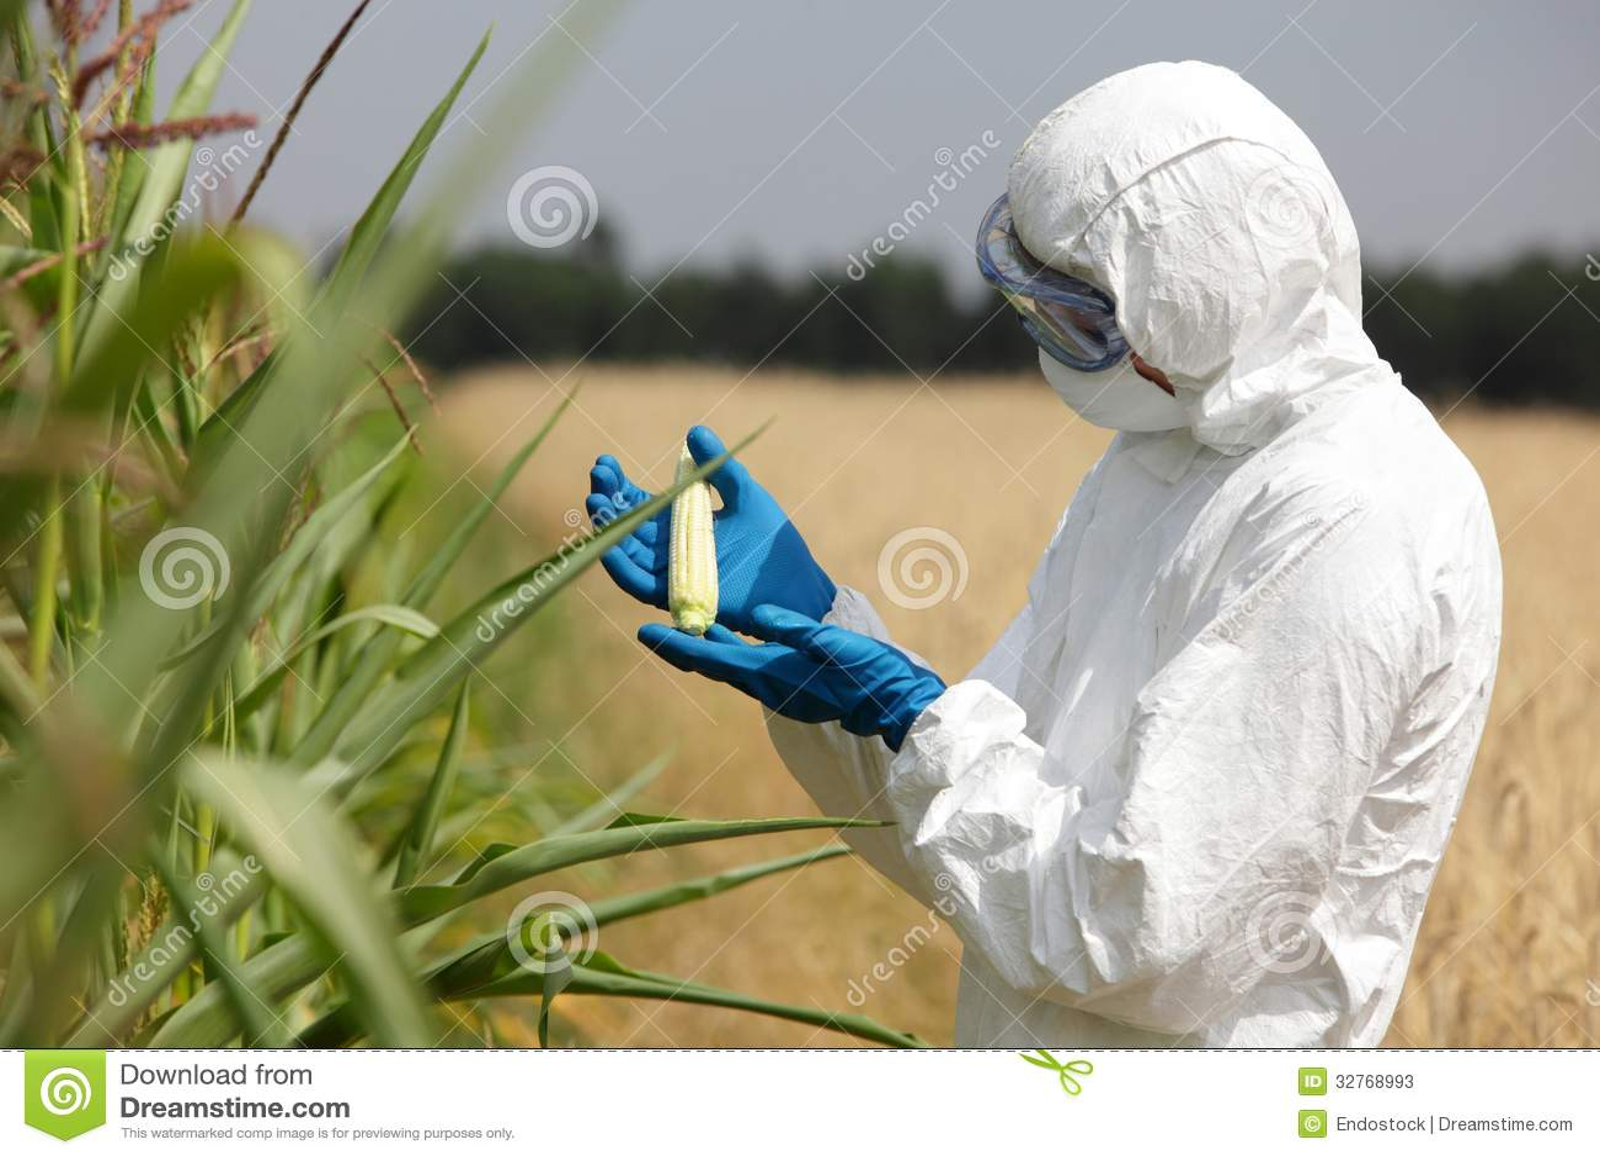 biotechnology engineer examining immature corn co stock